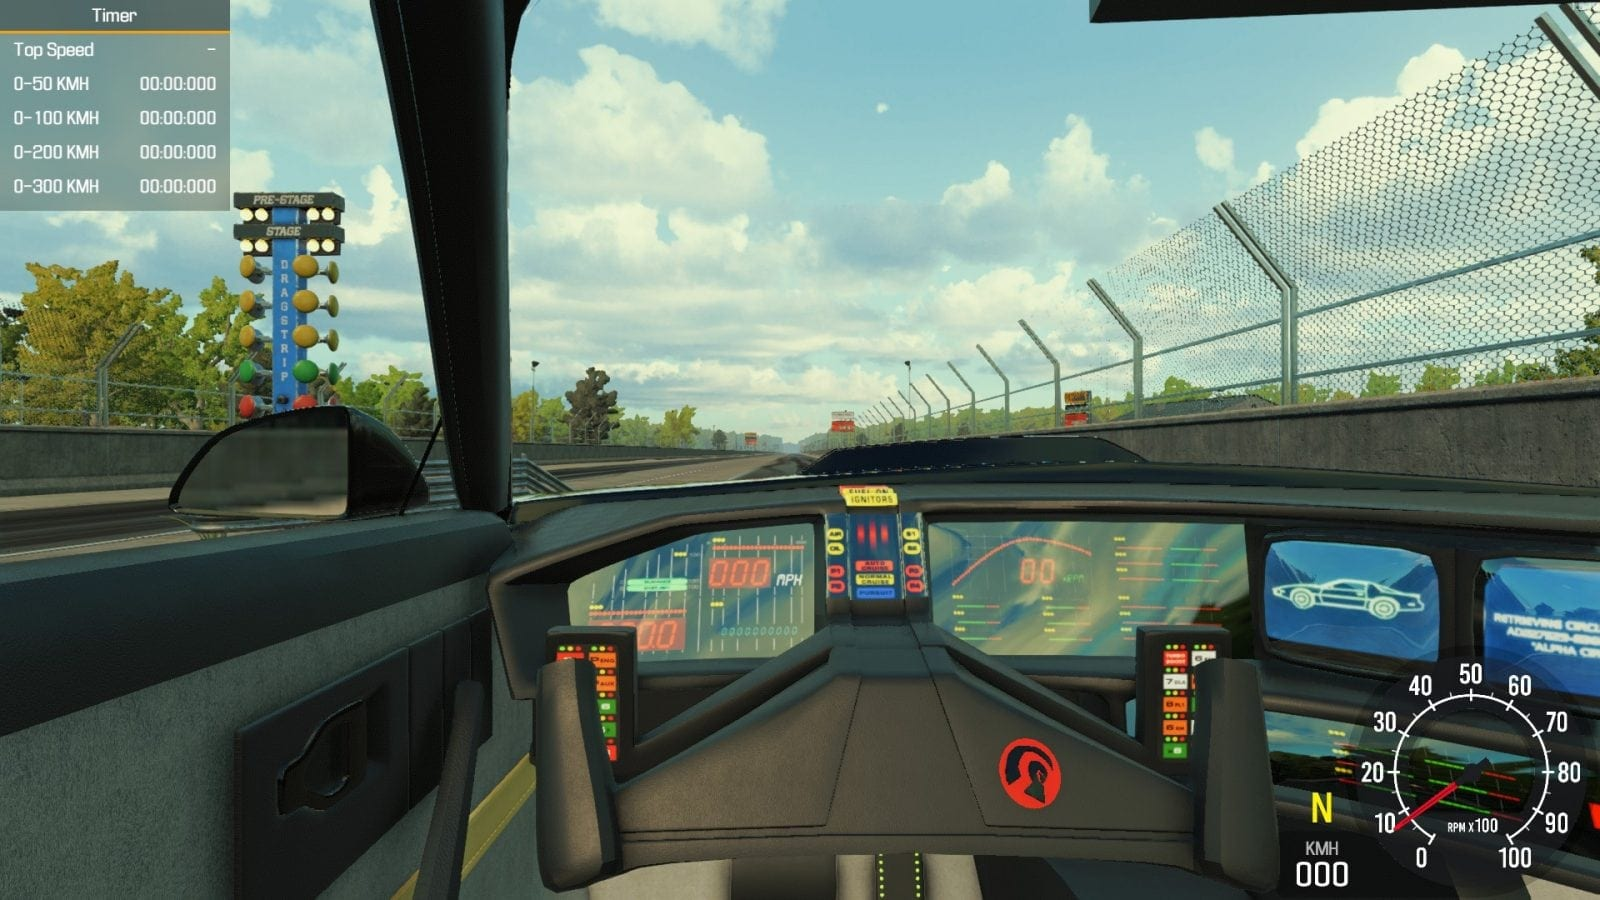 KITT Knight Industries Two Thousand Mod for Car Mechanic